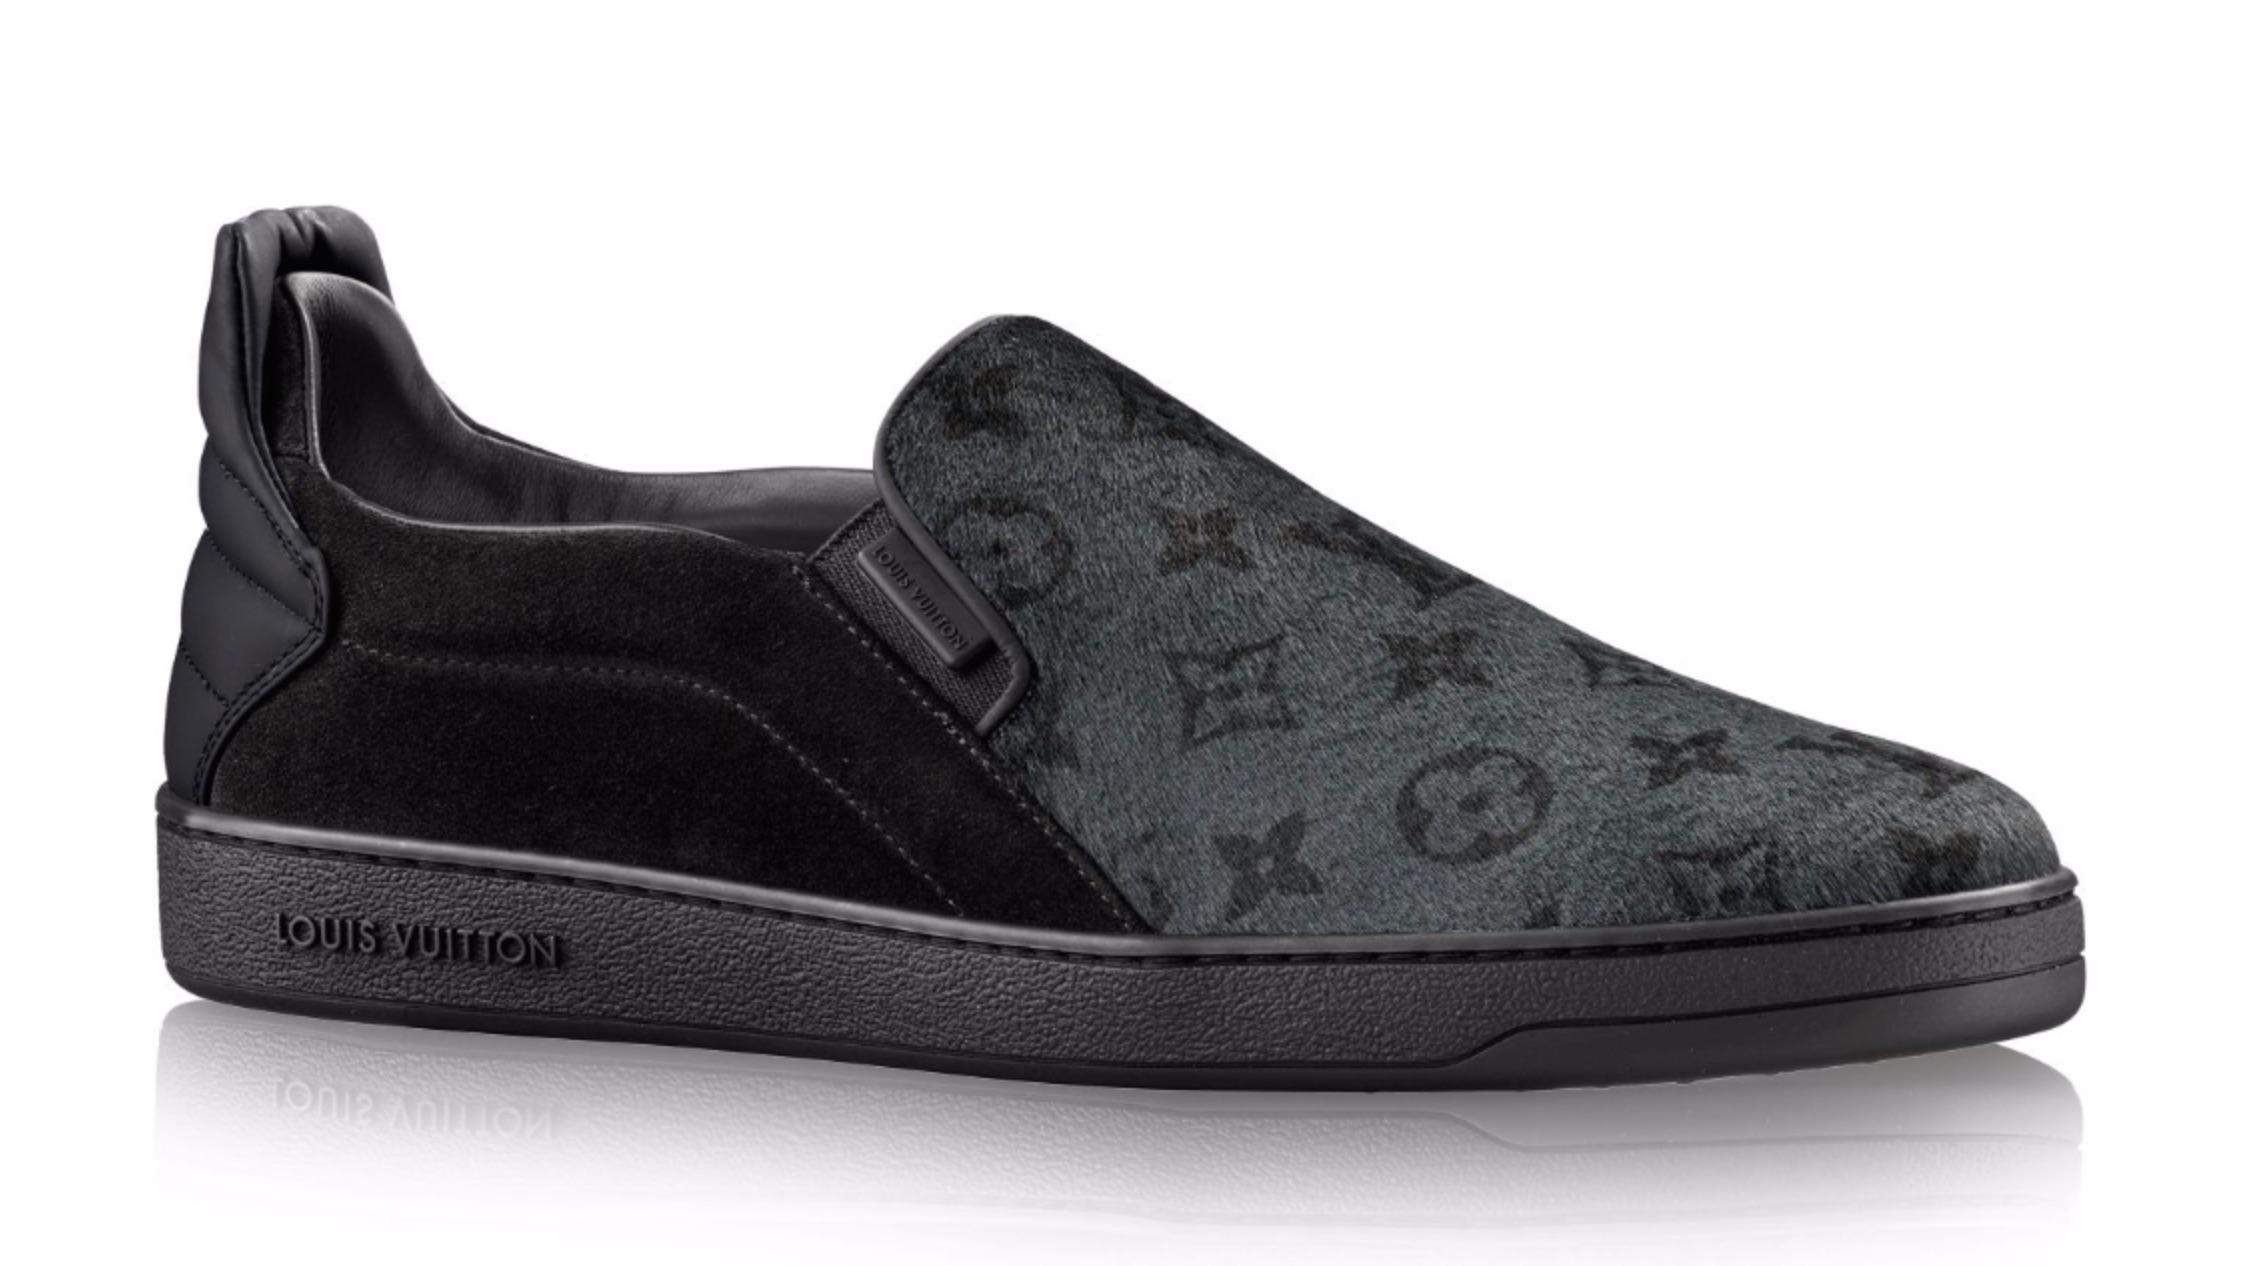 louis-vuitton-frontrow-slip-on-sneakers